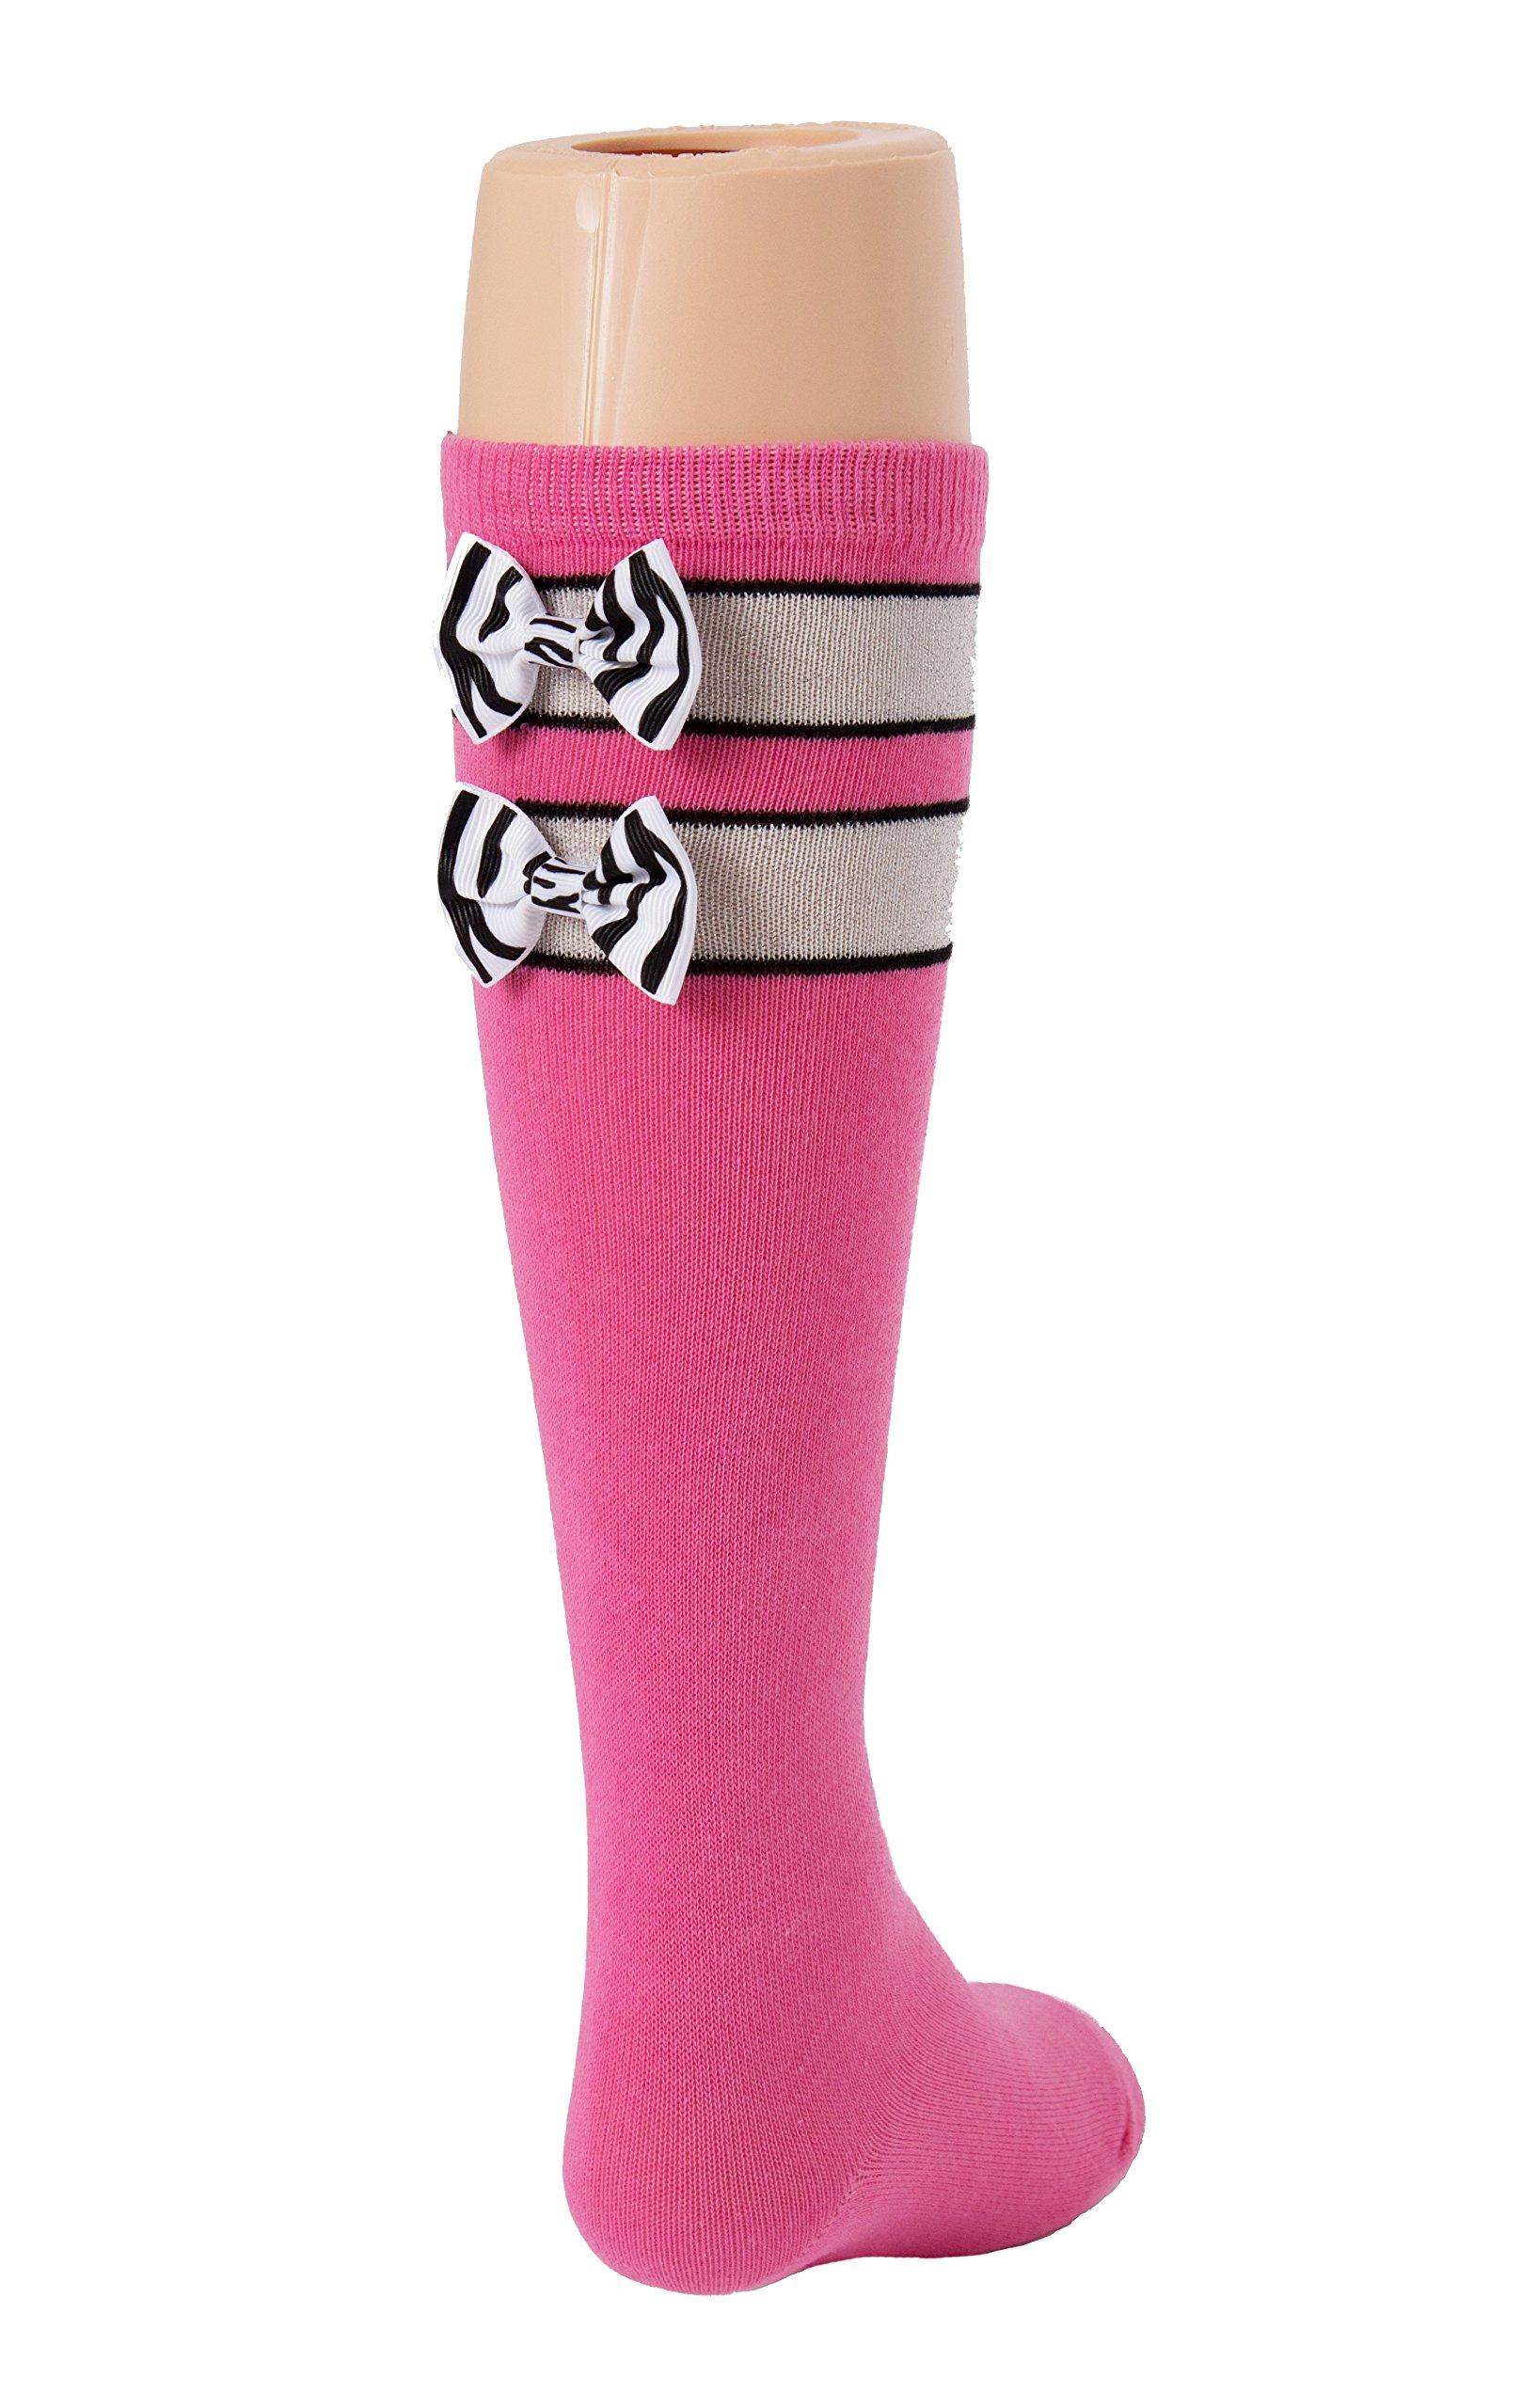 Pink Tot Jocks Girls Sports Socks Pink, Black and Silver with Zebra Print Bow Kids Size 9-2.5, Soccer, Volleyball, Softball, Field Hockey